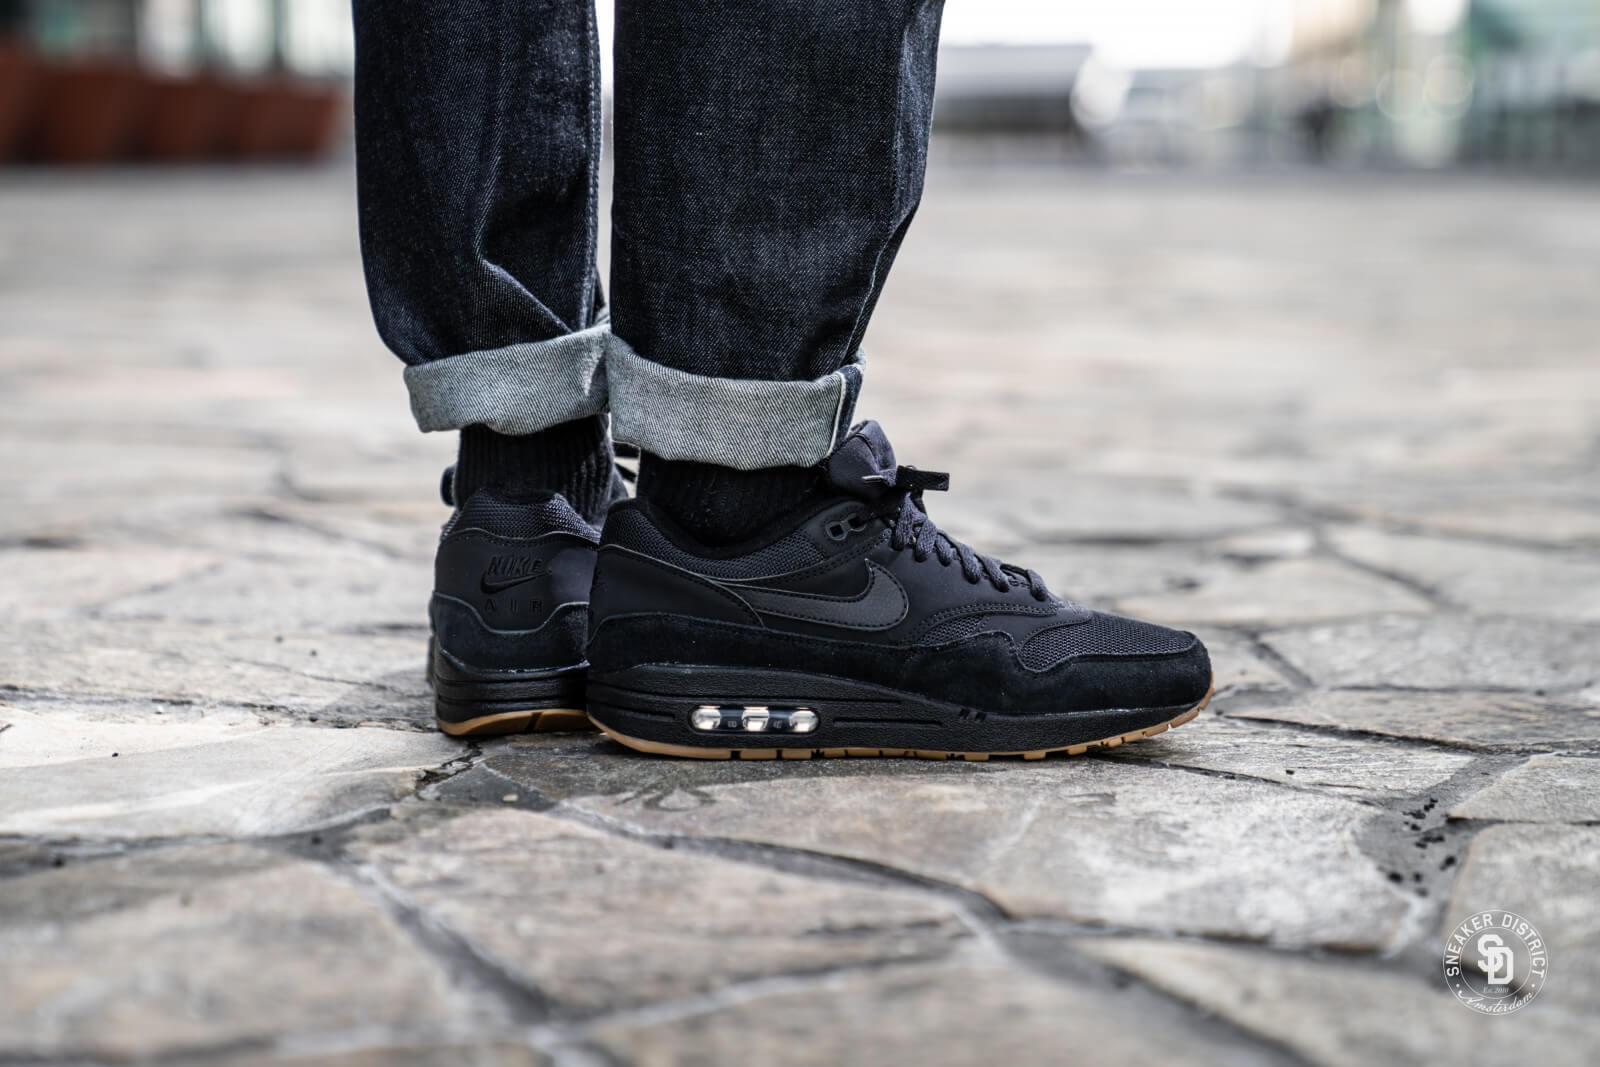 Nike Air Max 1 Black/Black-Gum